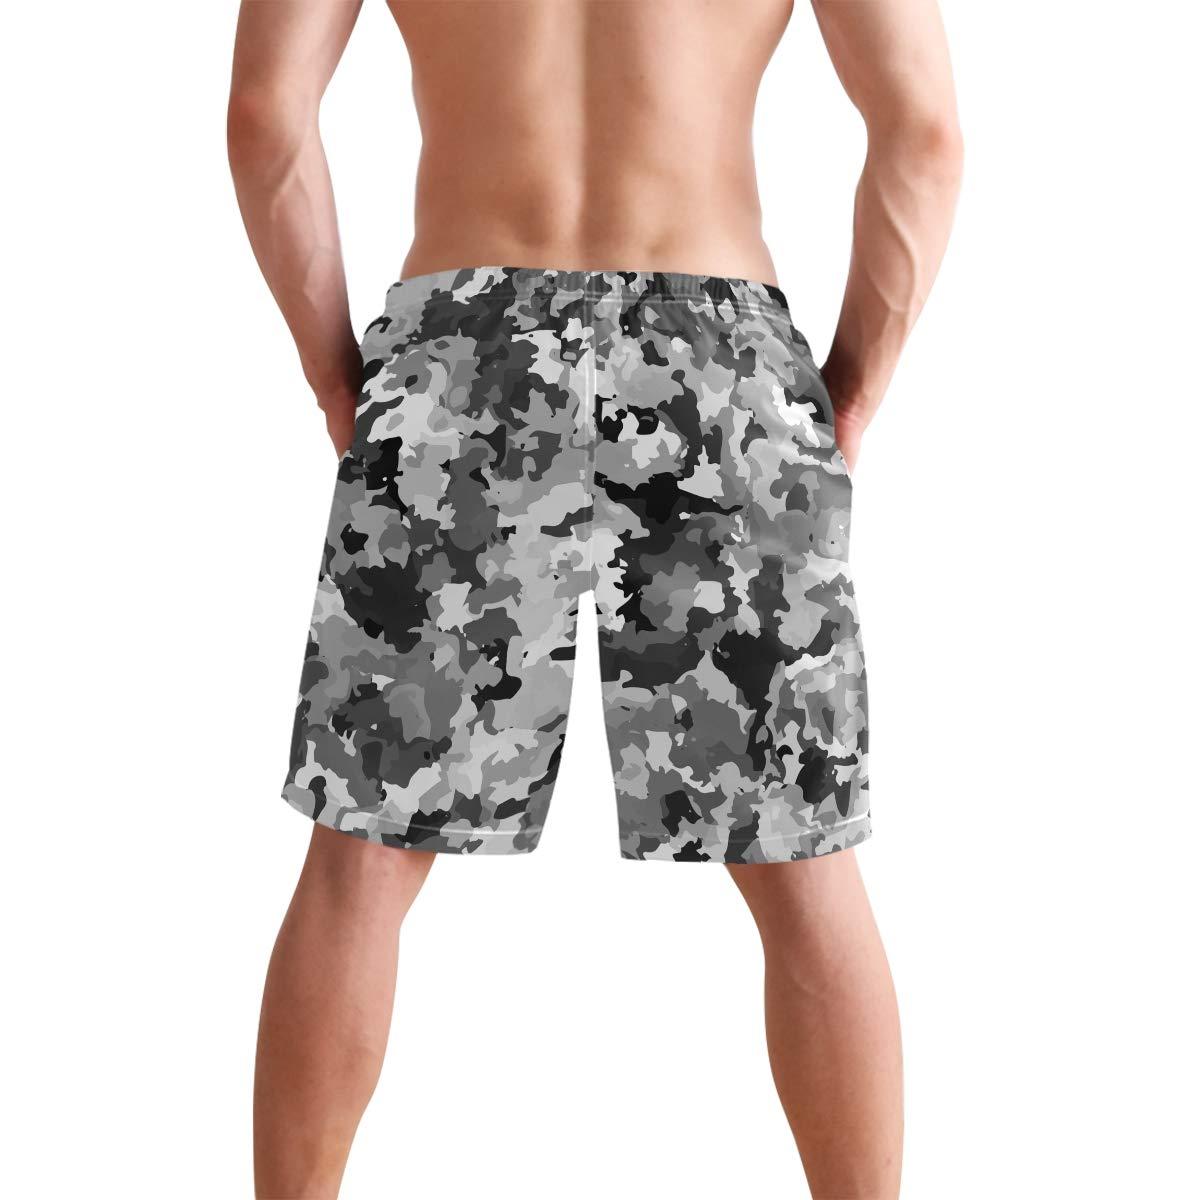 Camouflage Mens Trunks Beach Board Shorts Drawstring Waist Mesh Lining